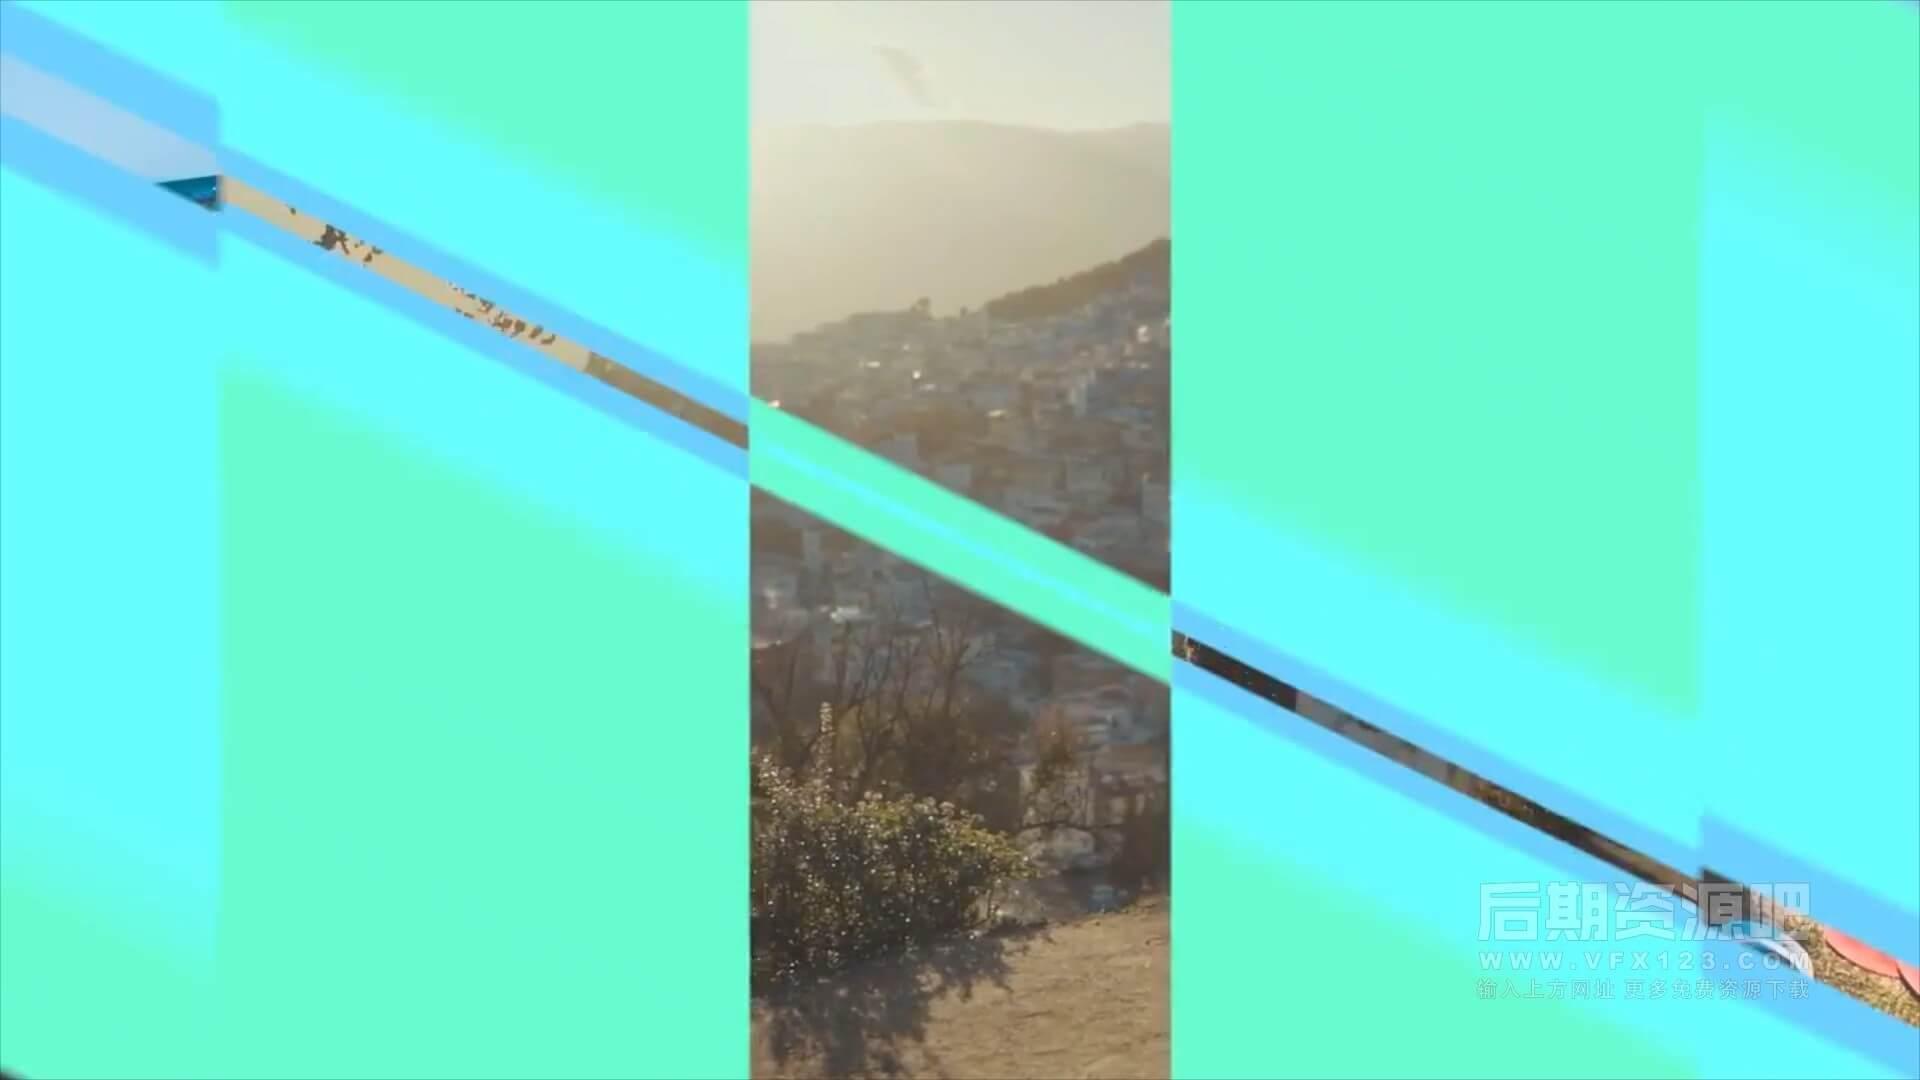 fcpx转场插件 炫酷时尚形状分割动画过渡转场预设 Split Shape Transitions